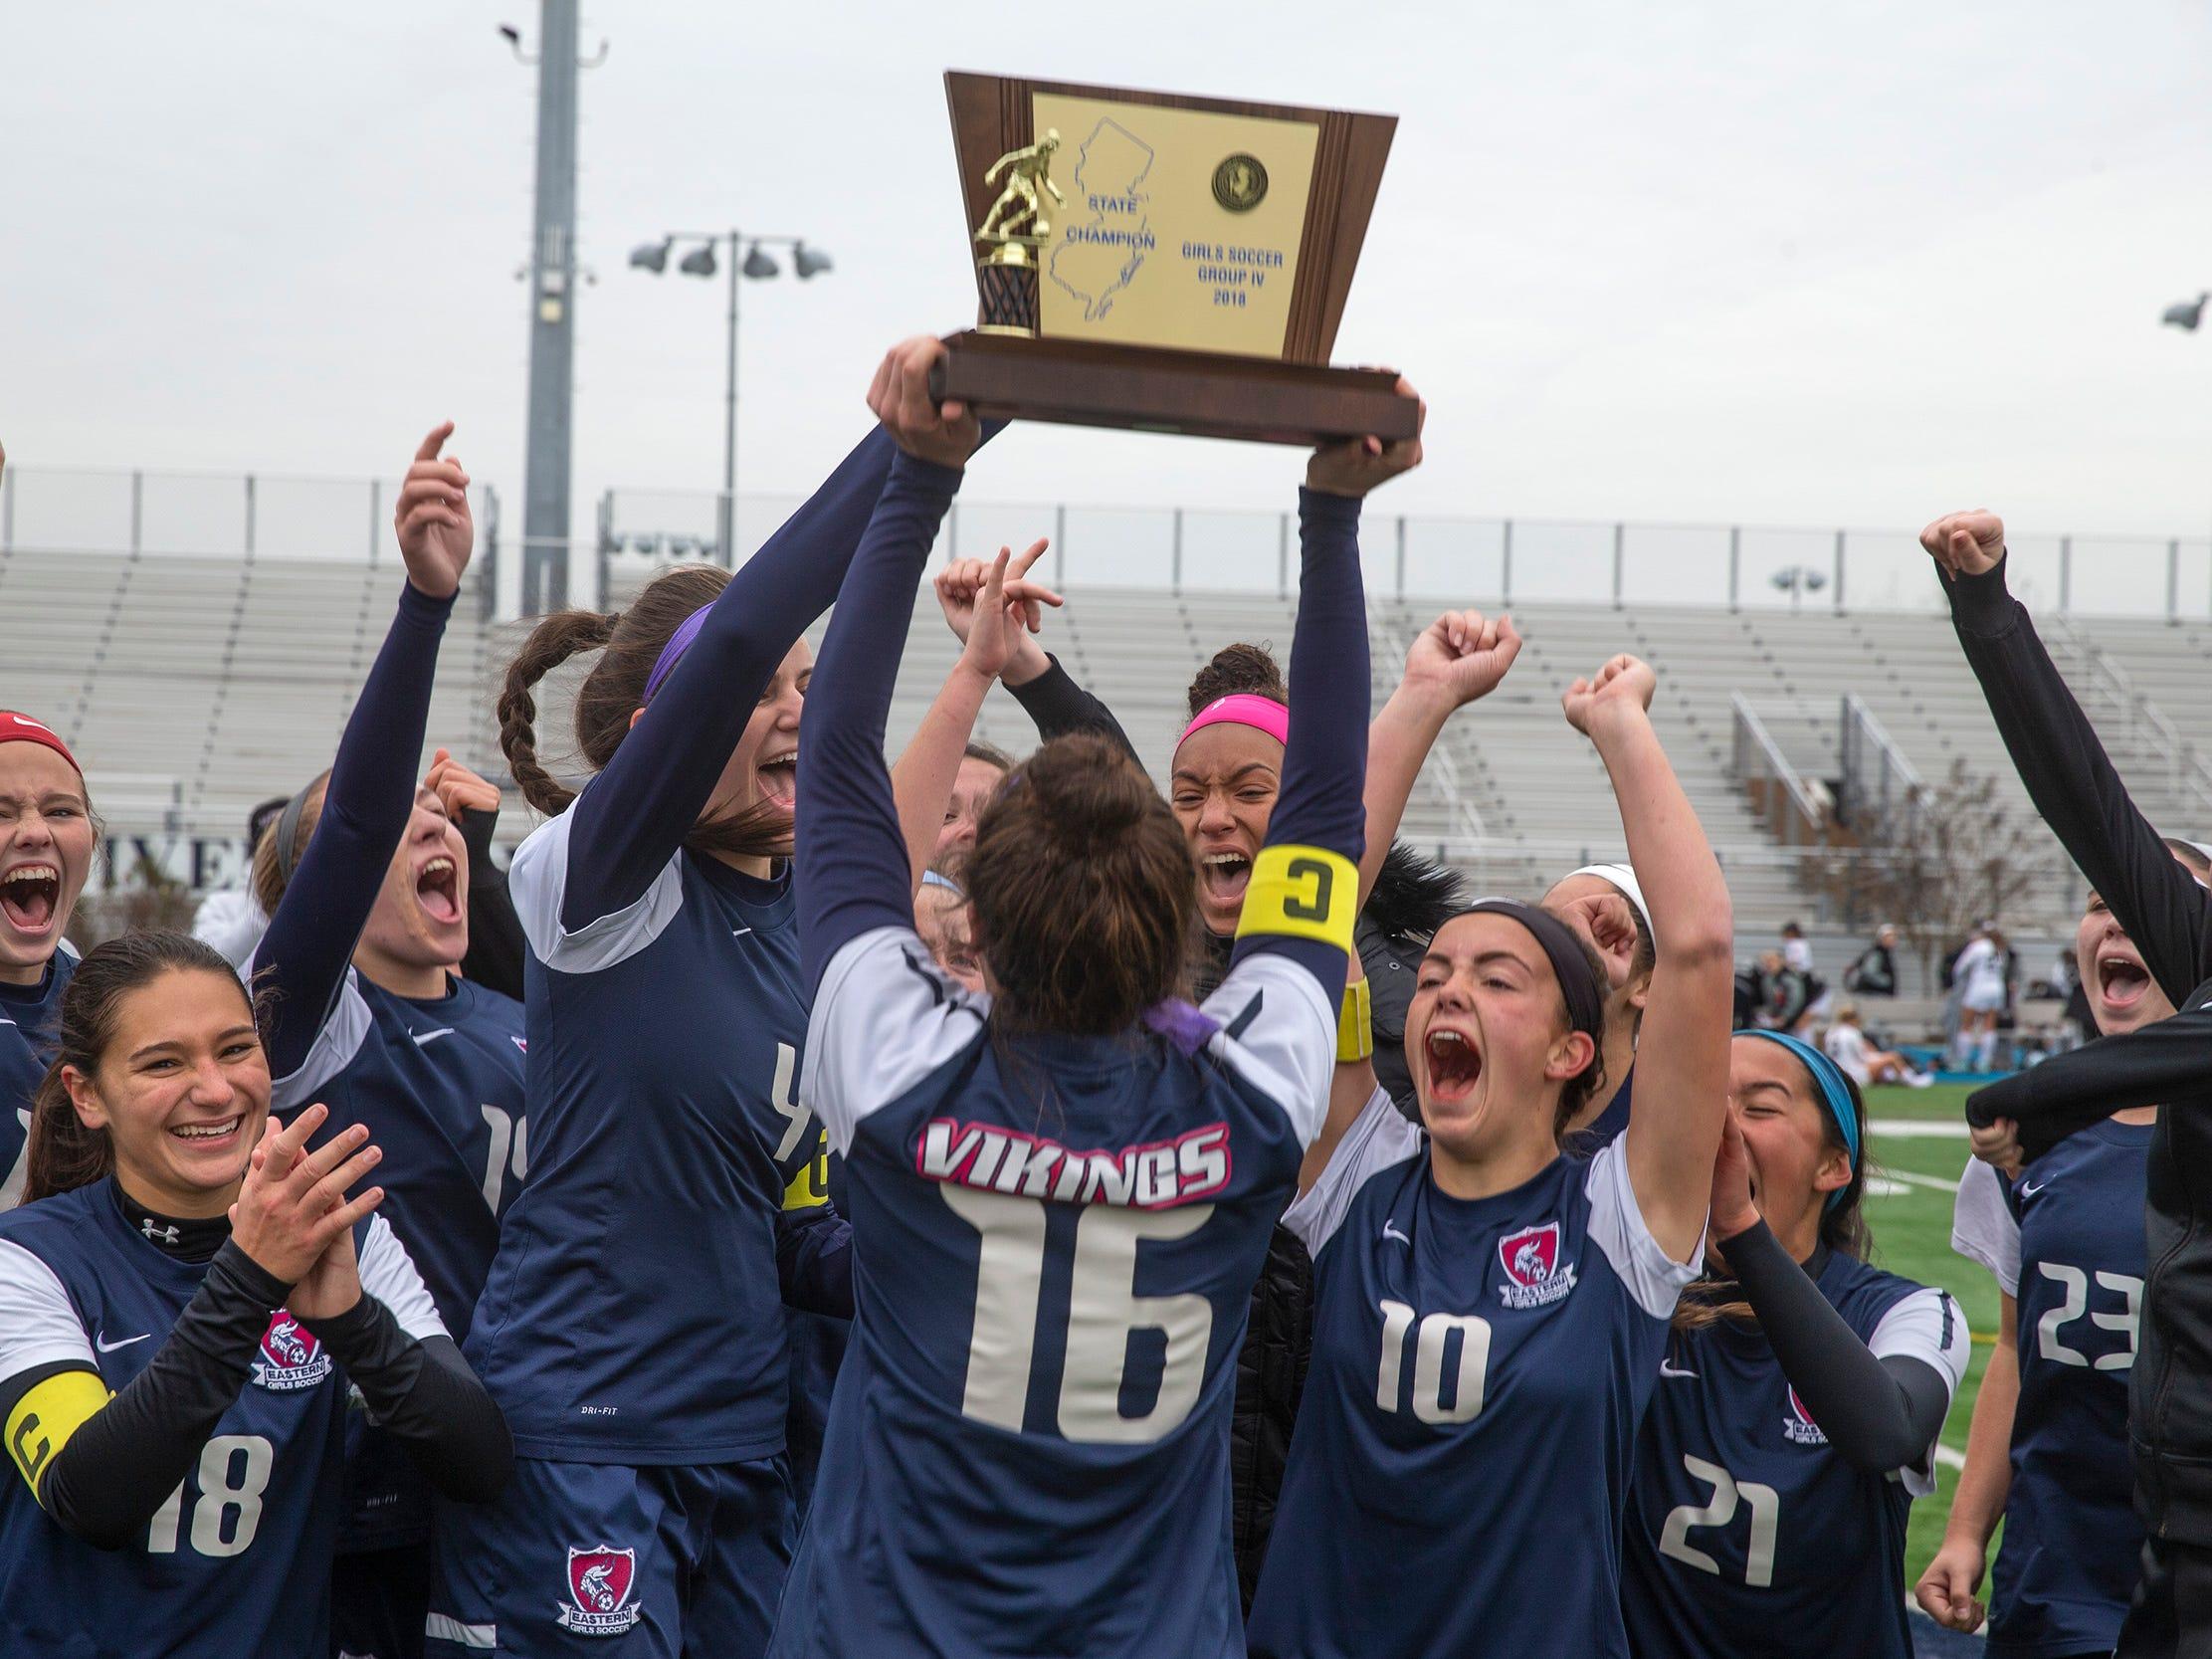 Eastern celebrates their Group IV championship. Bridgewater-Raritan vs. Eastern girls soccer in the NJSIAA Group IV final at Kean University.